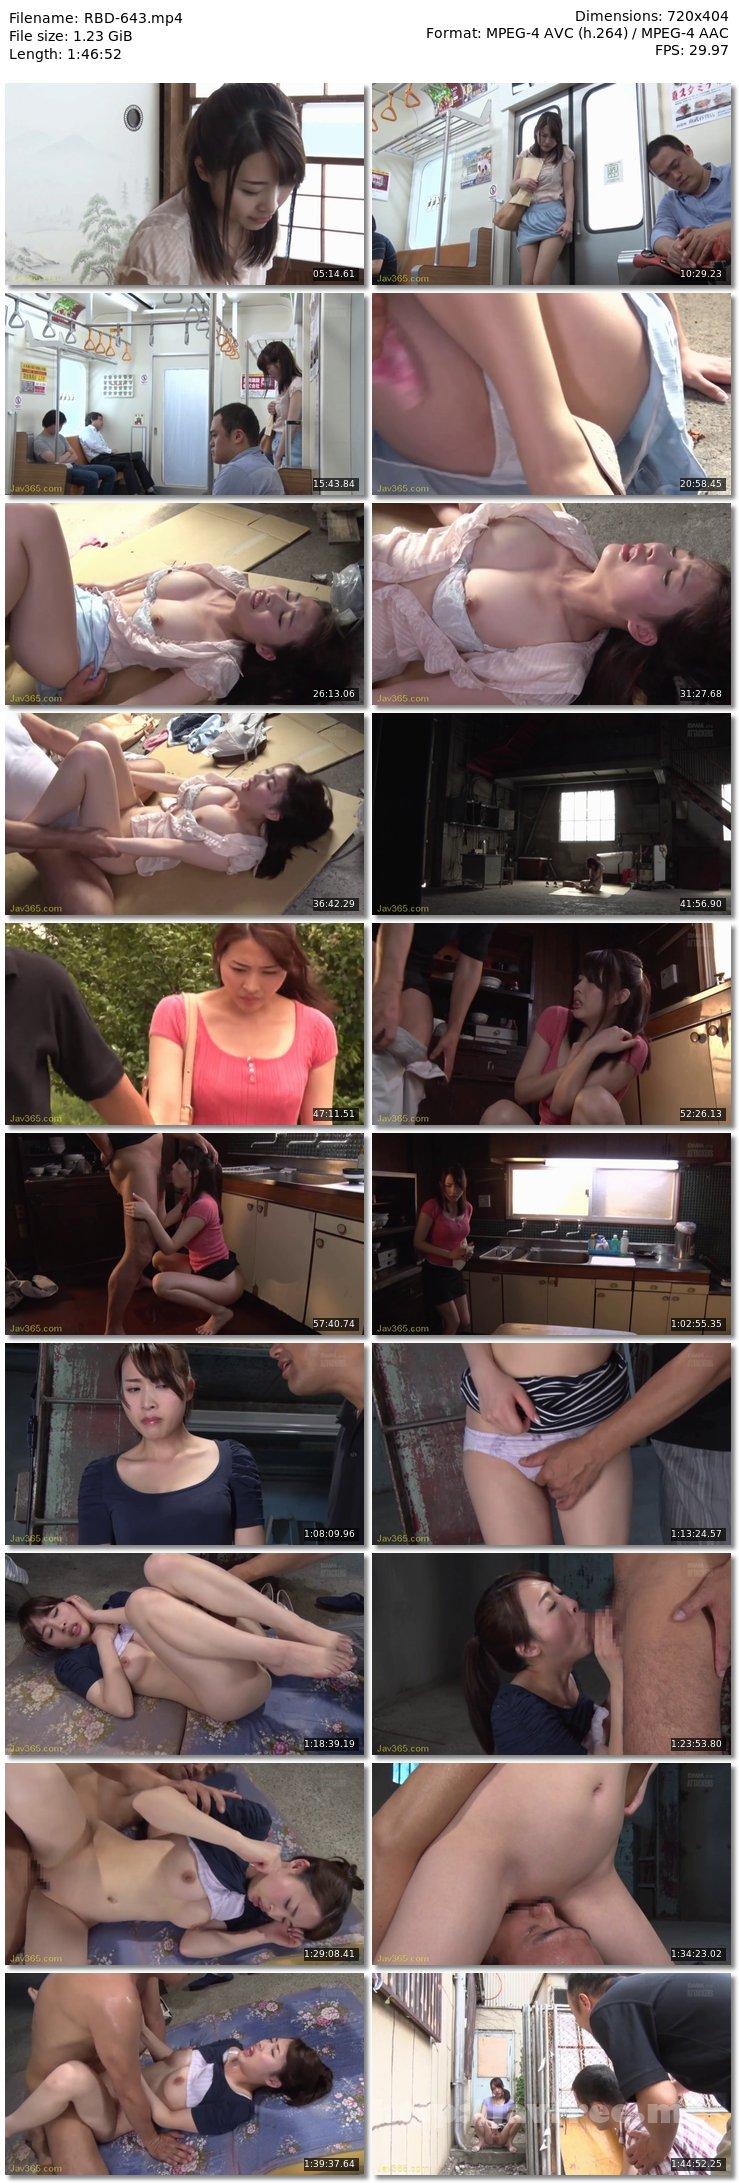 [RBD 643] おもらし羞恥 恥辱に濡れた快感 本田岬 本田岬 RBD